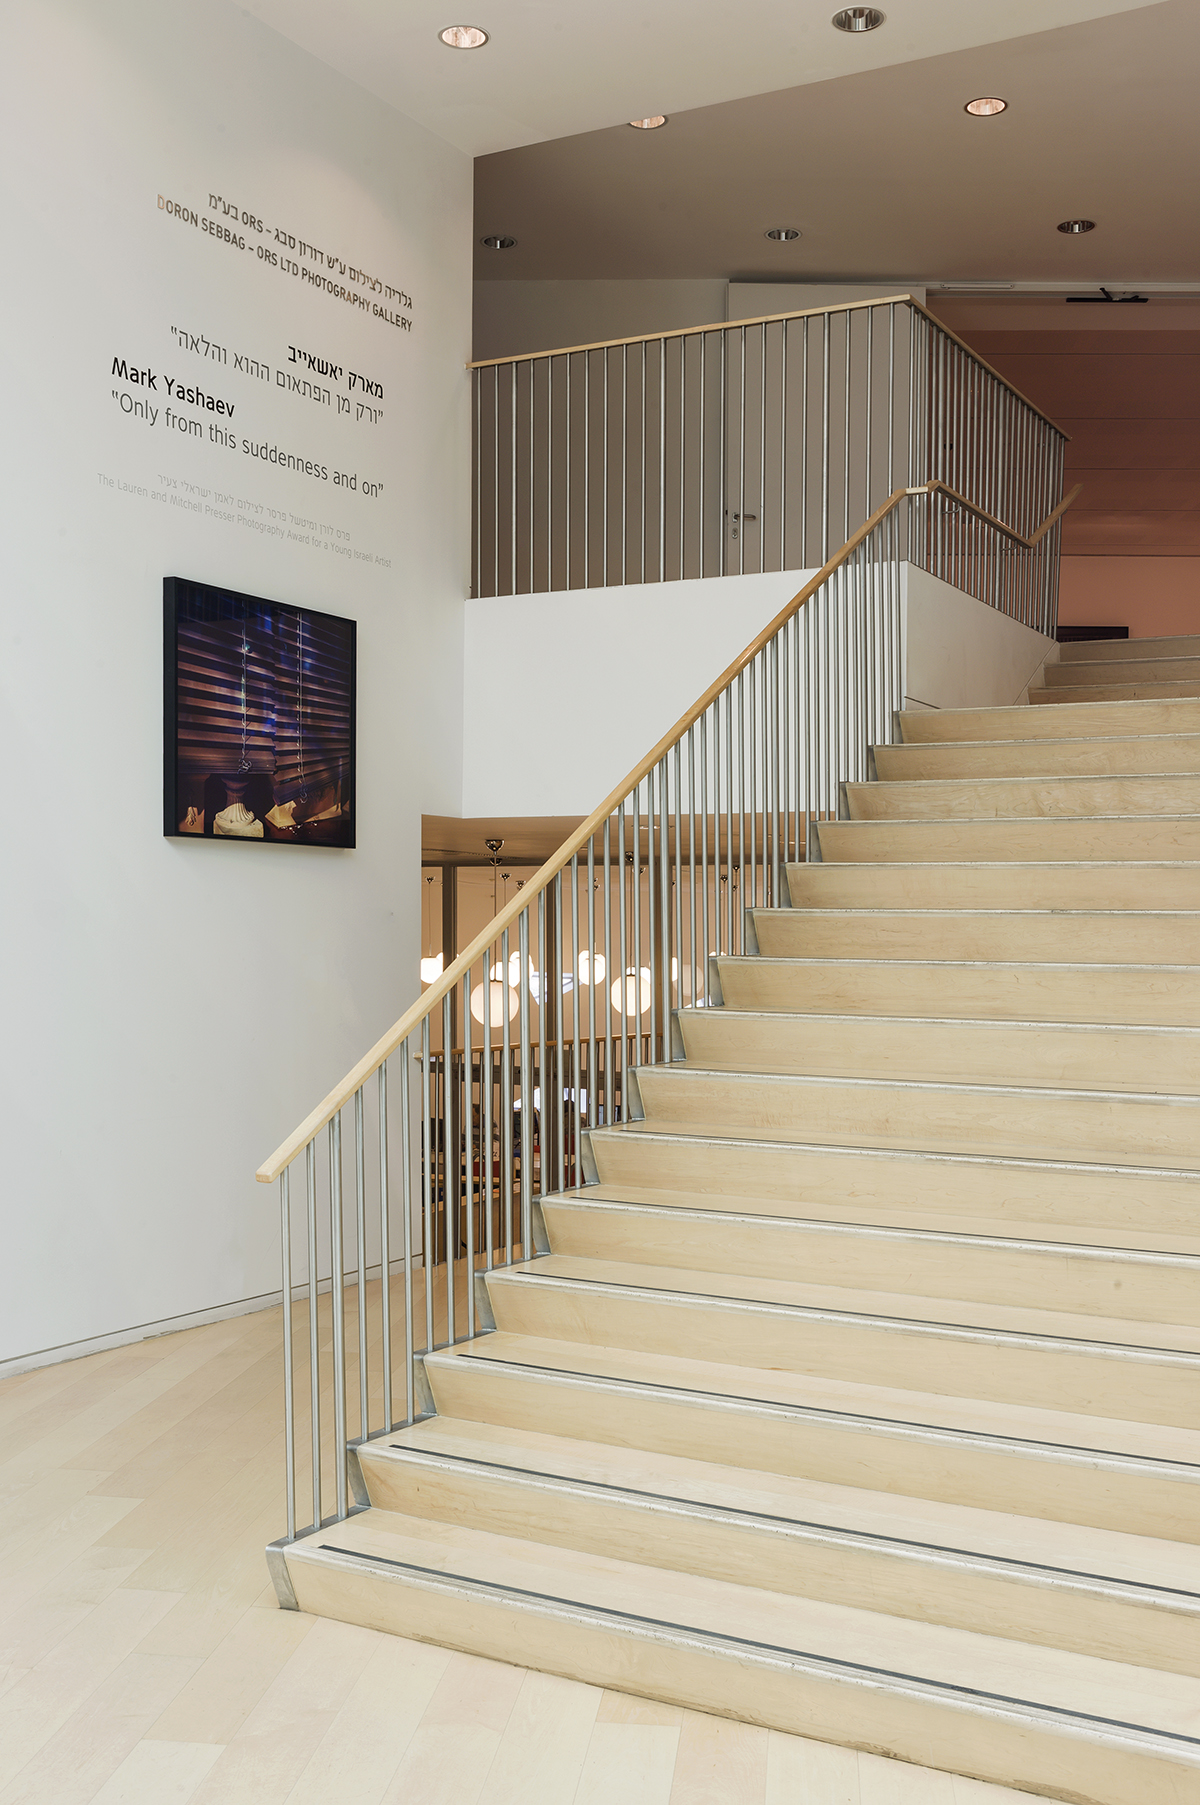 Tel-Aviv Museum of Art Solo Exhibition Installation View